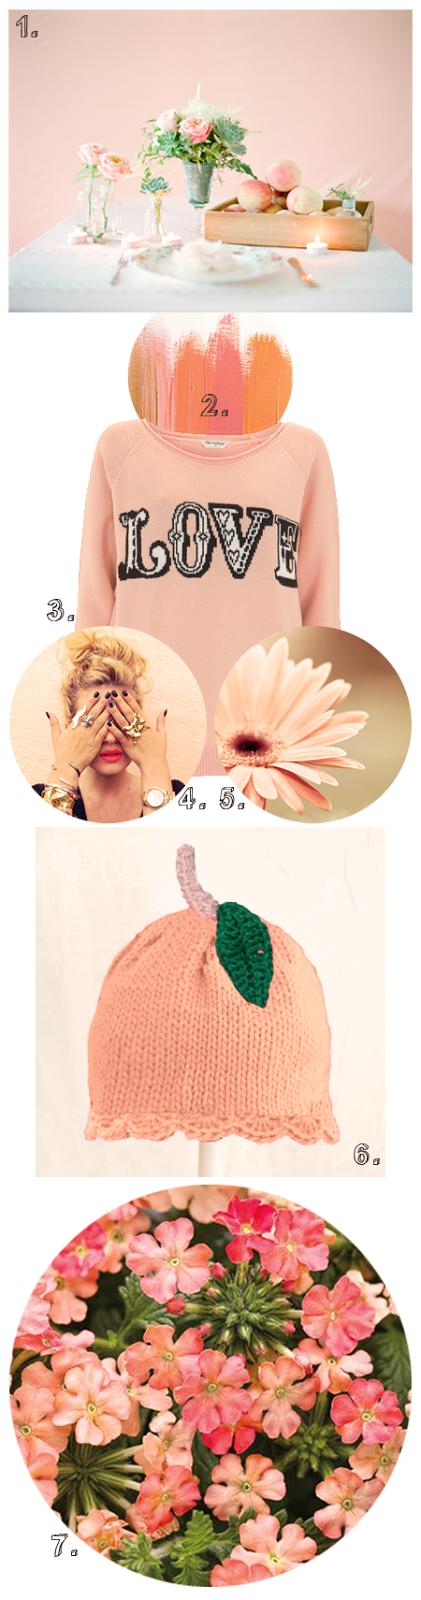 peach_blog.png